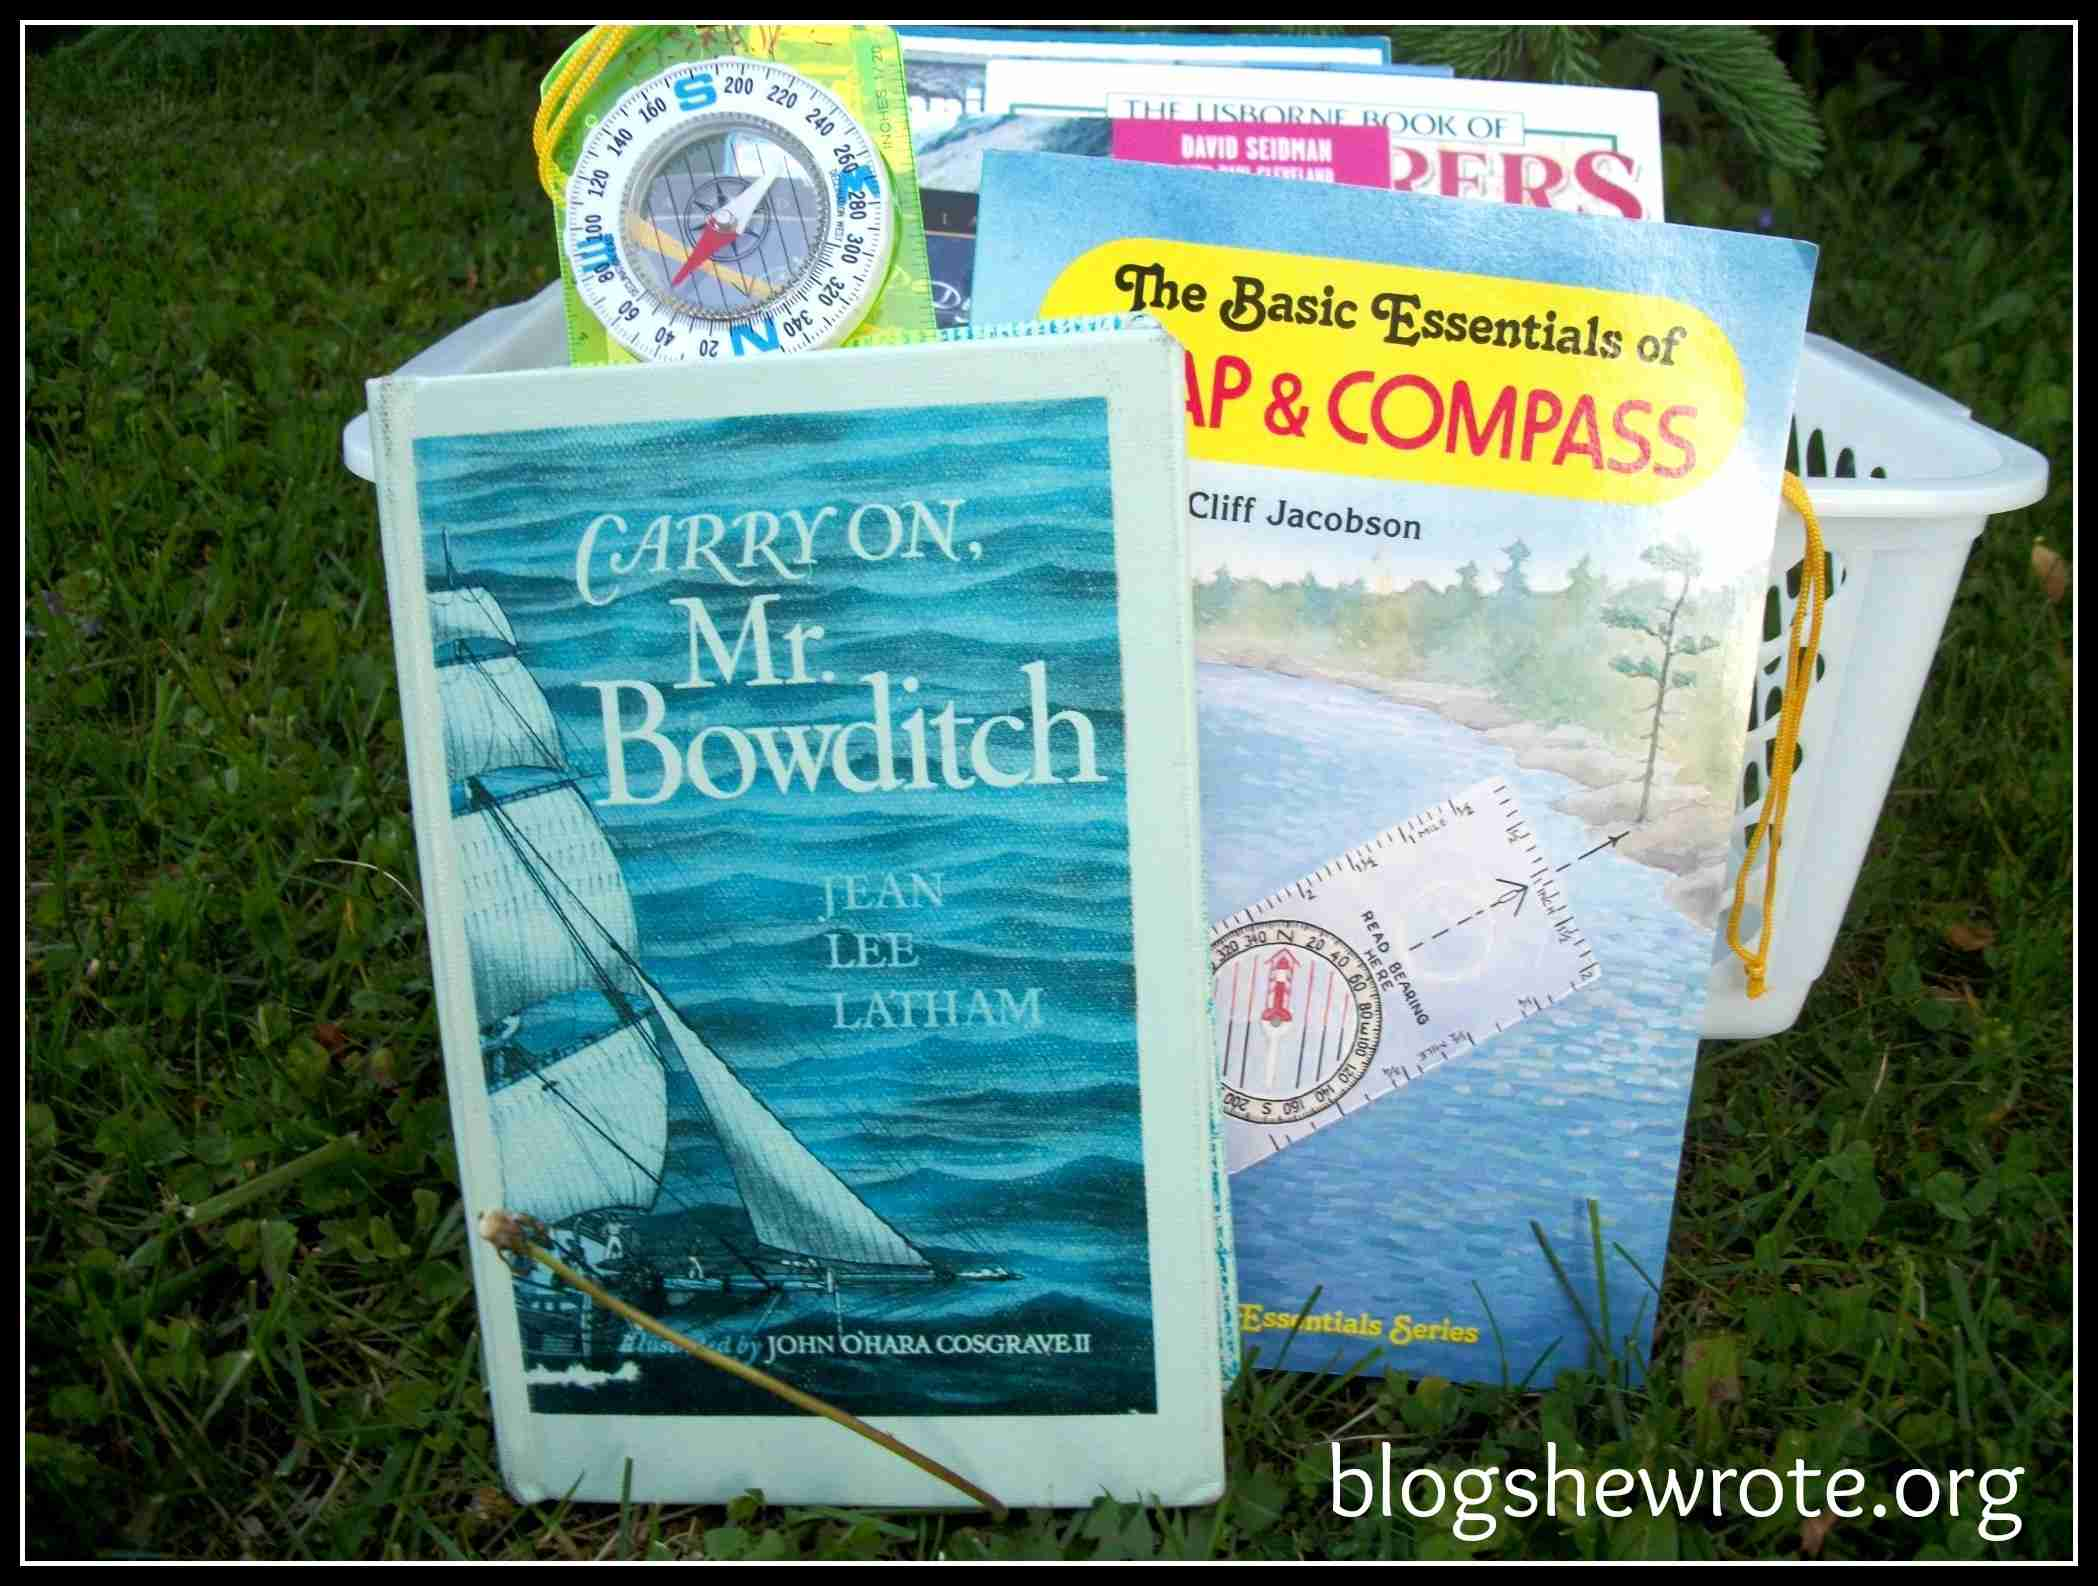 Blog She Wrote: Exploration & Navigation